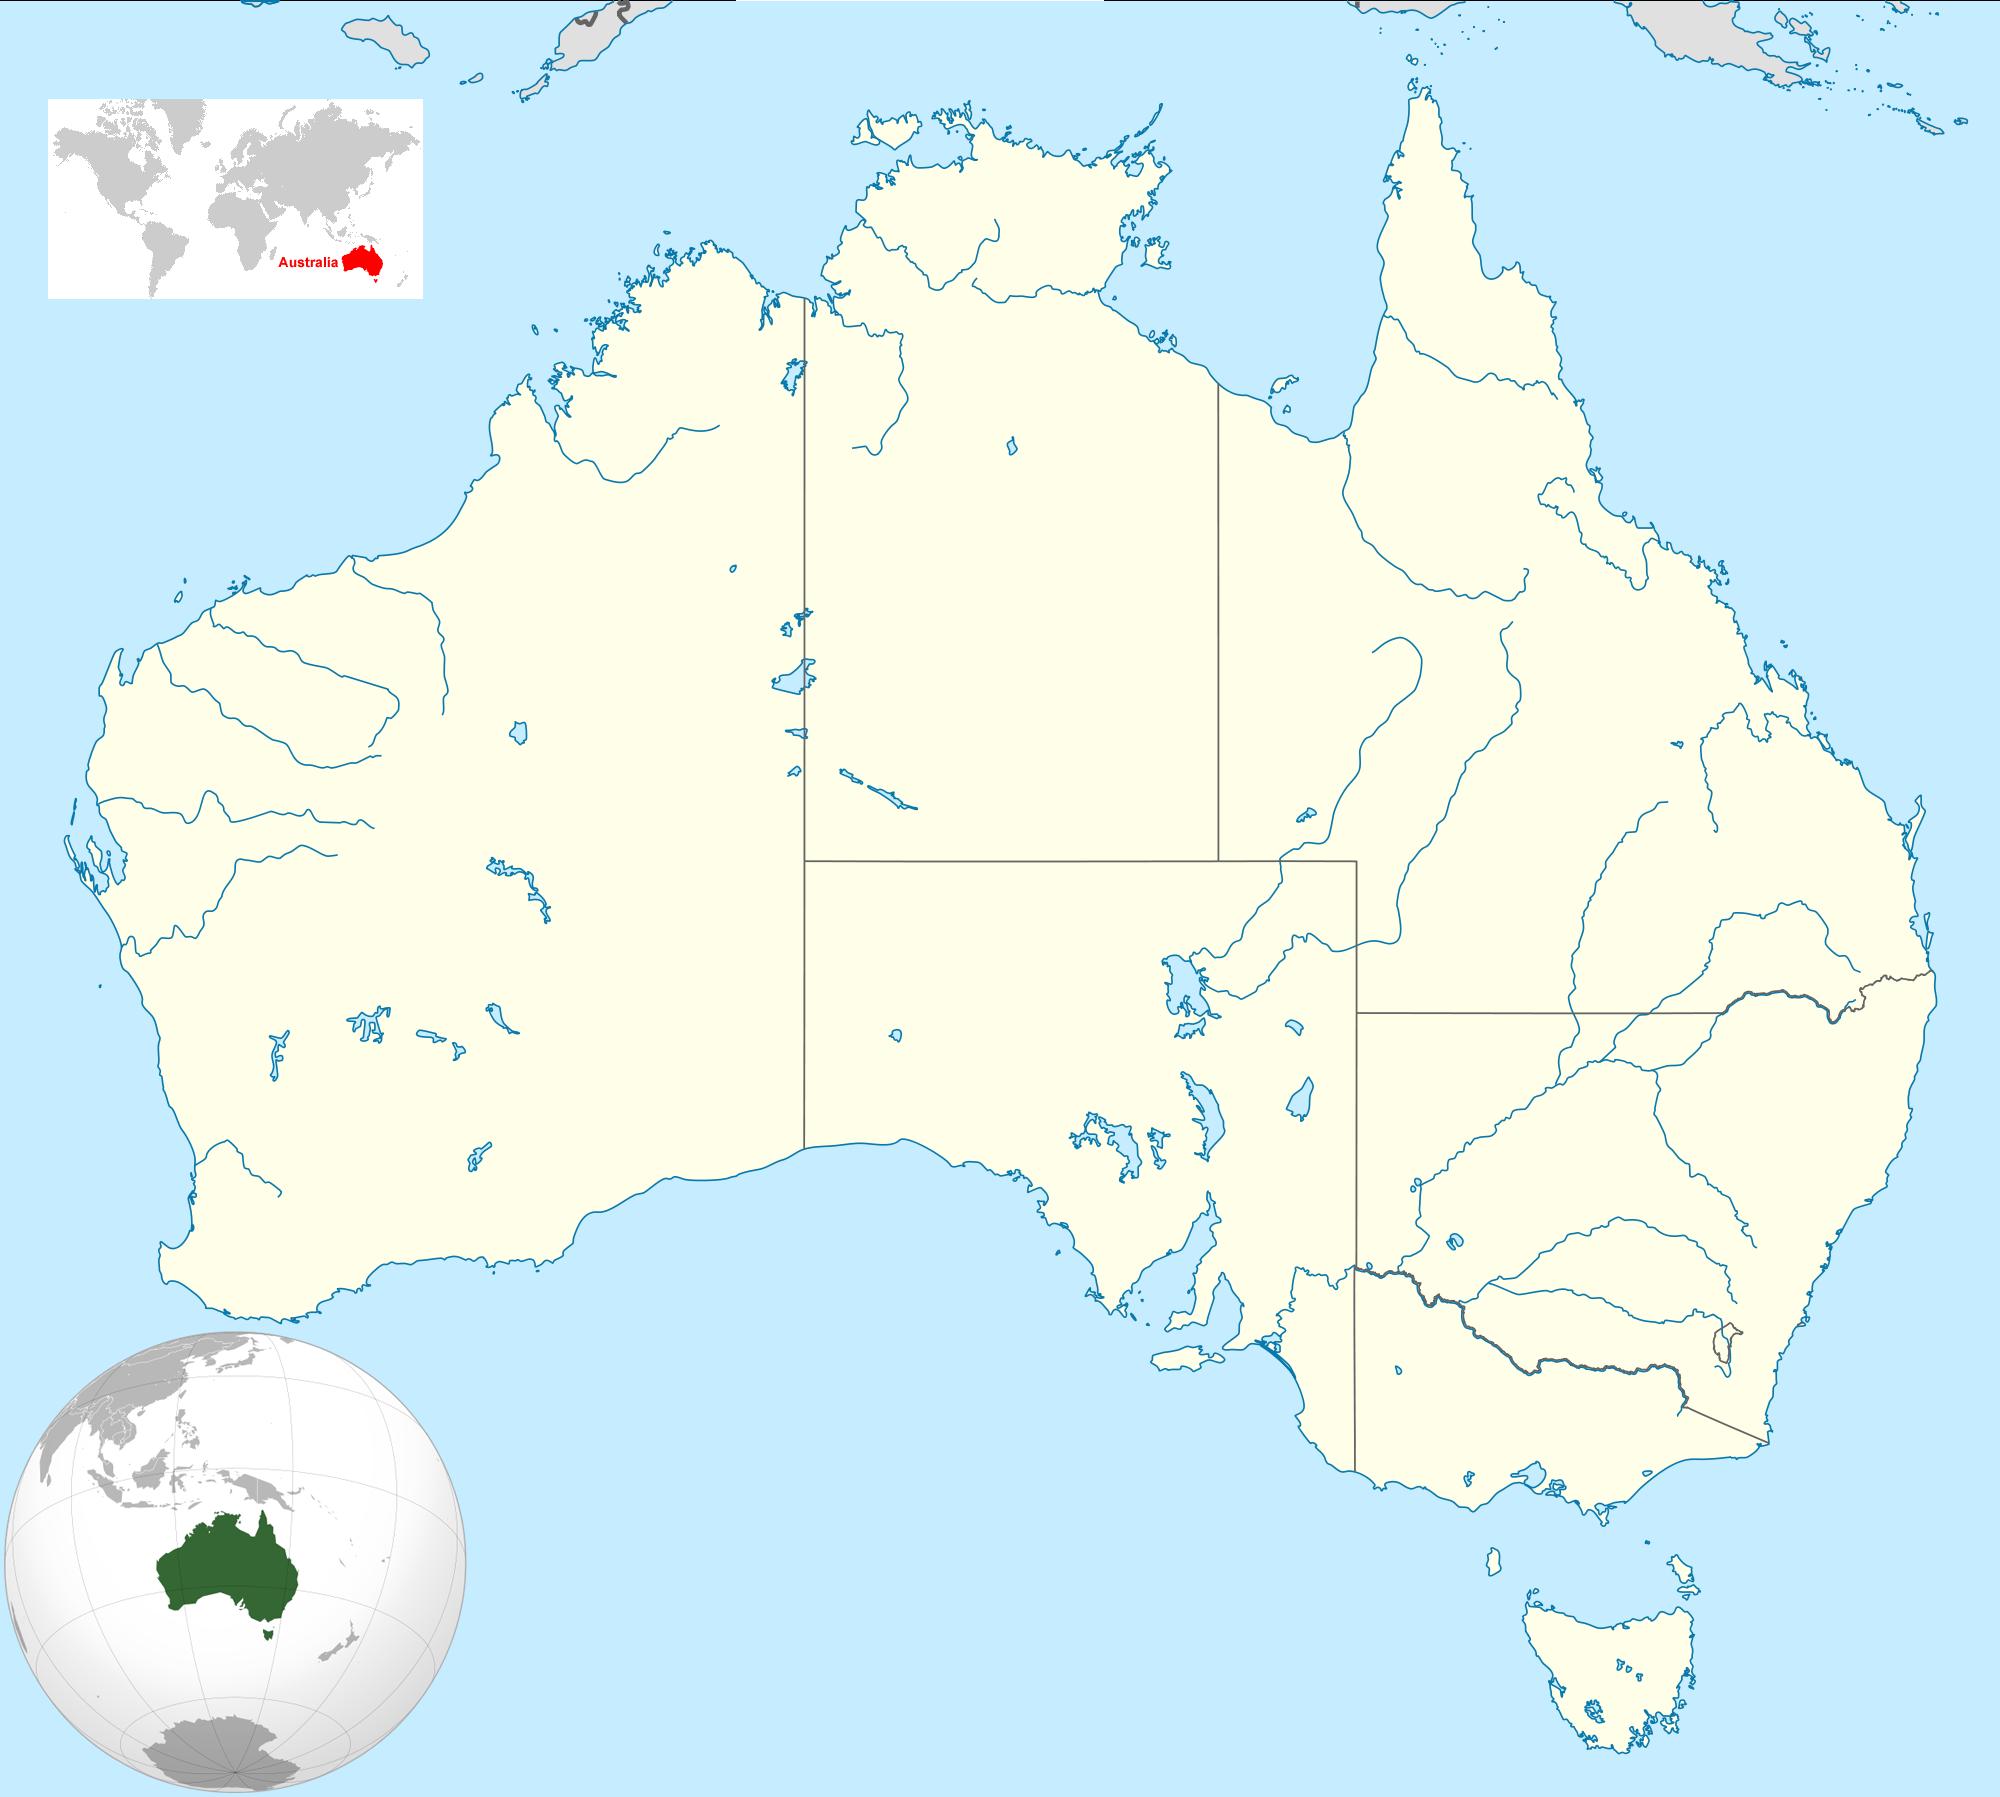 australia location map landkarten kostenlos cliparts. Black Bedroom Furniture Sets. Home Design Ideas